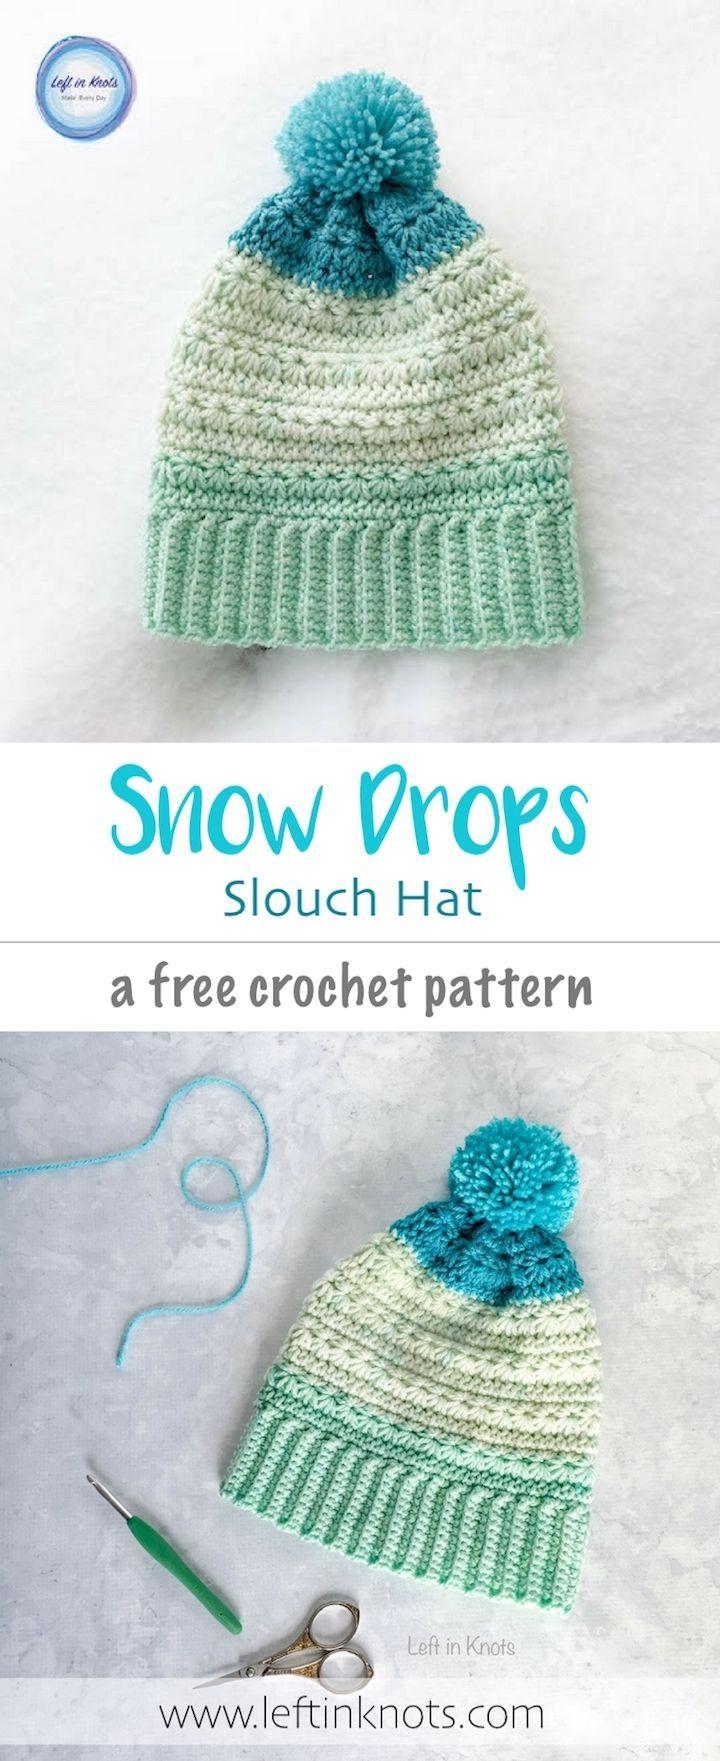 Snow Drops Slouch Hat Free Crochet Pattern Crochet Hats And